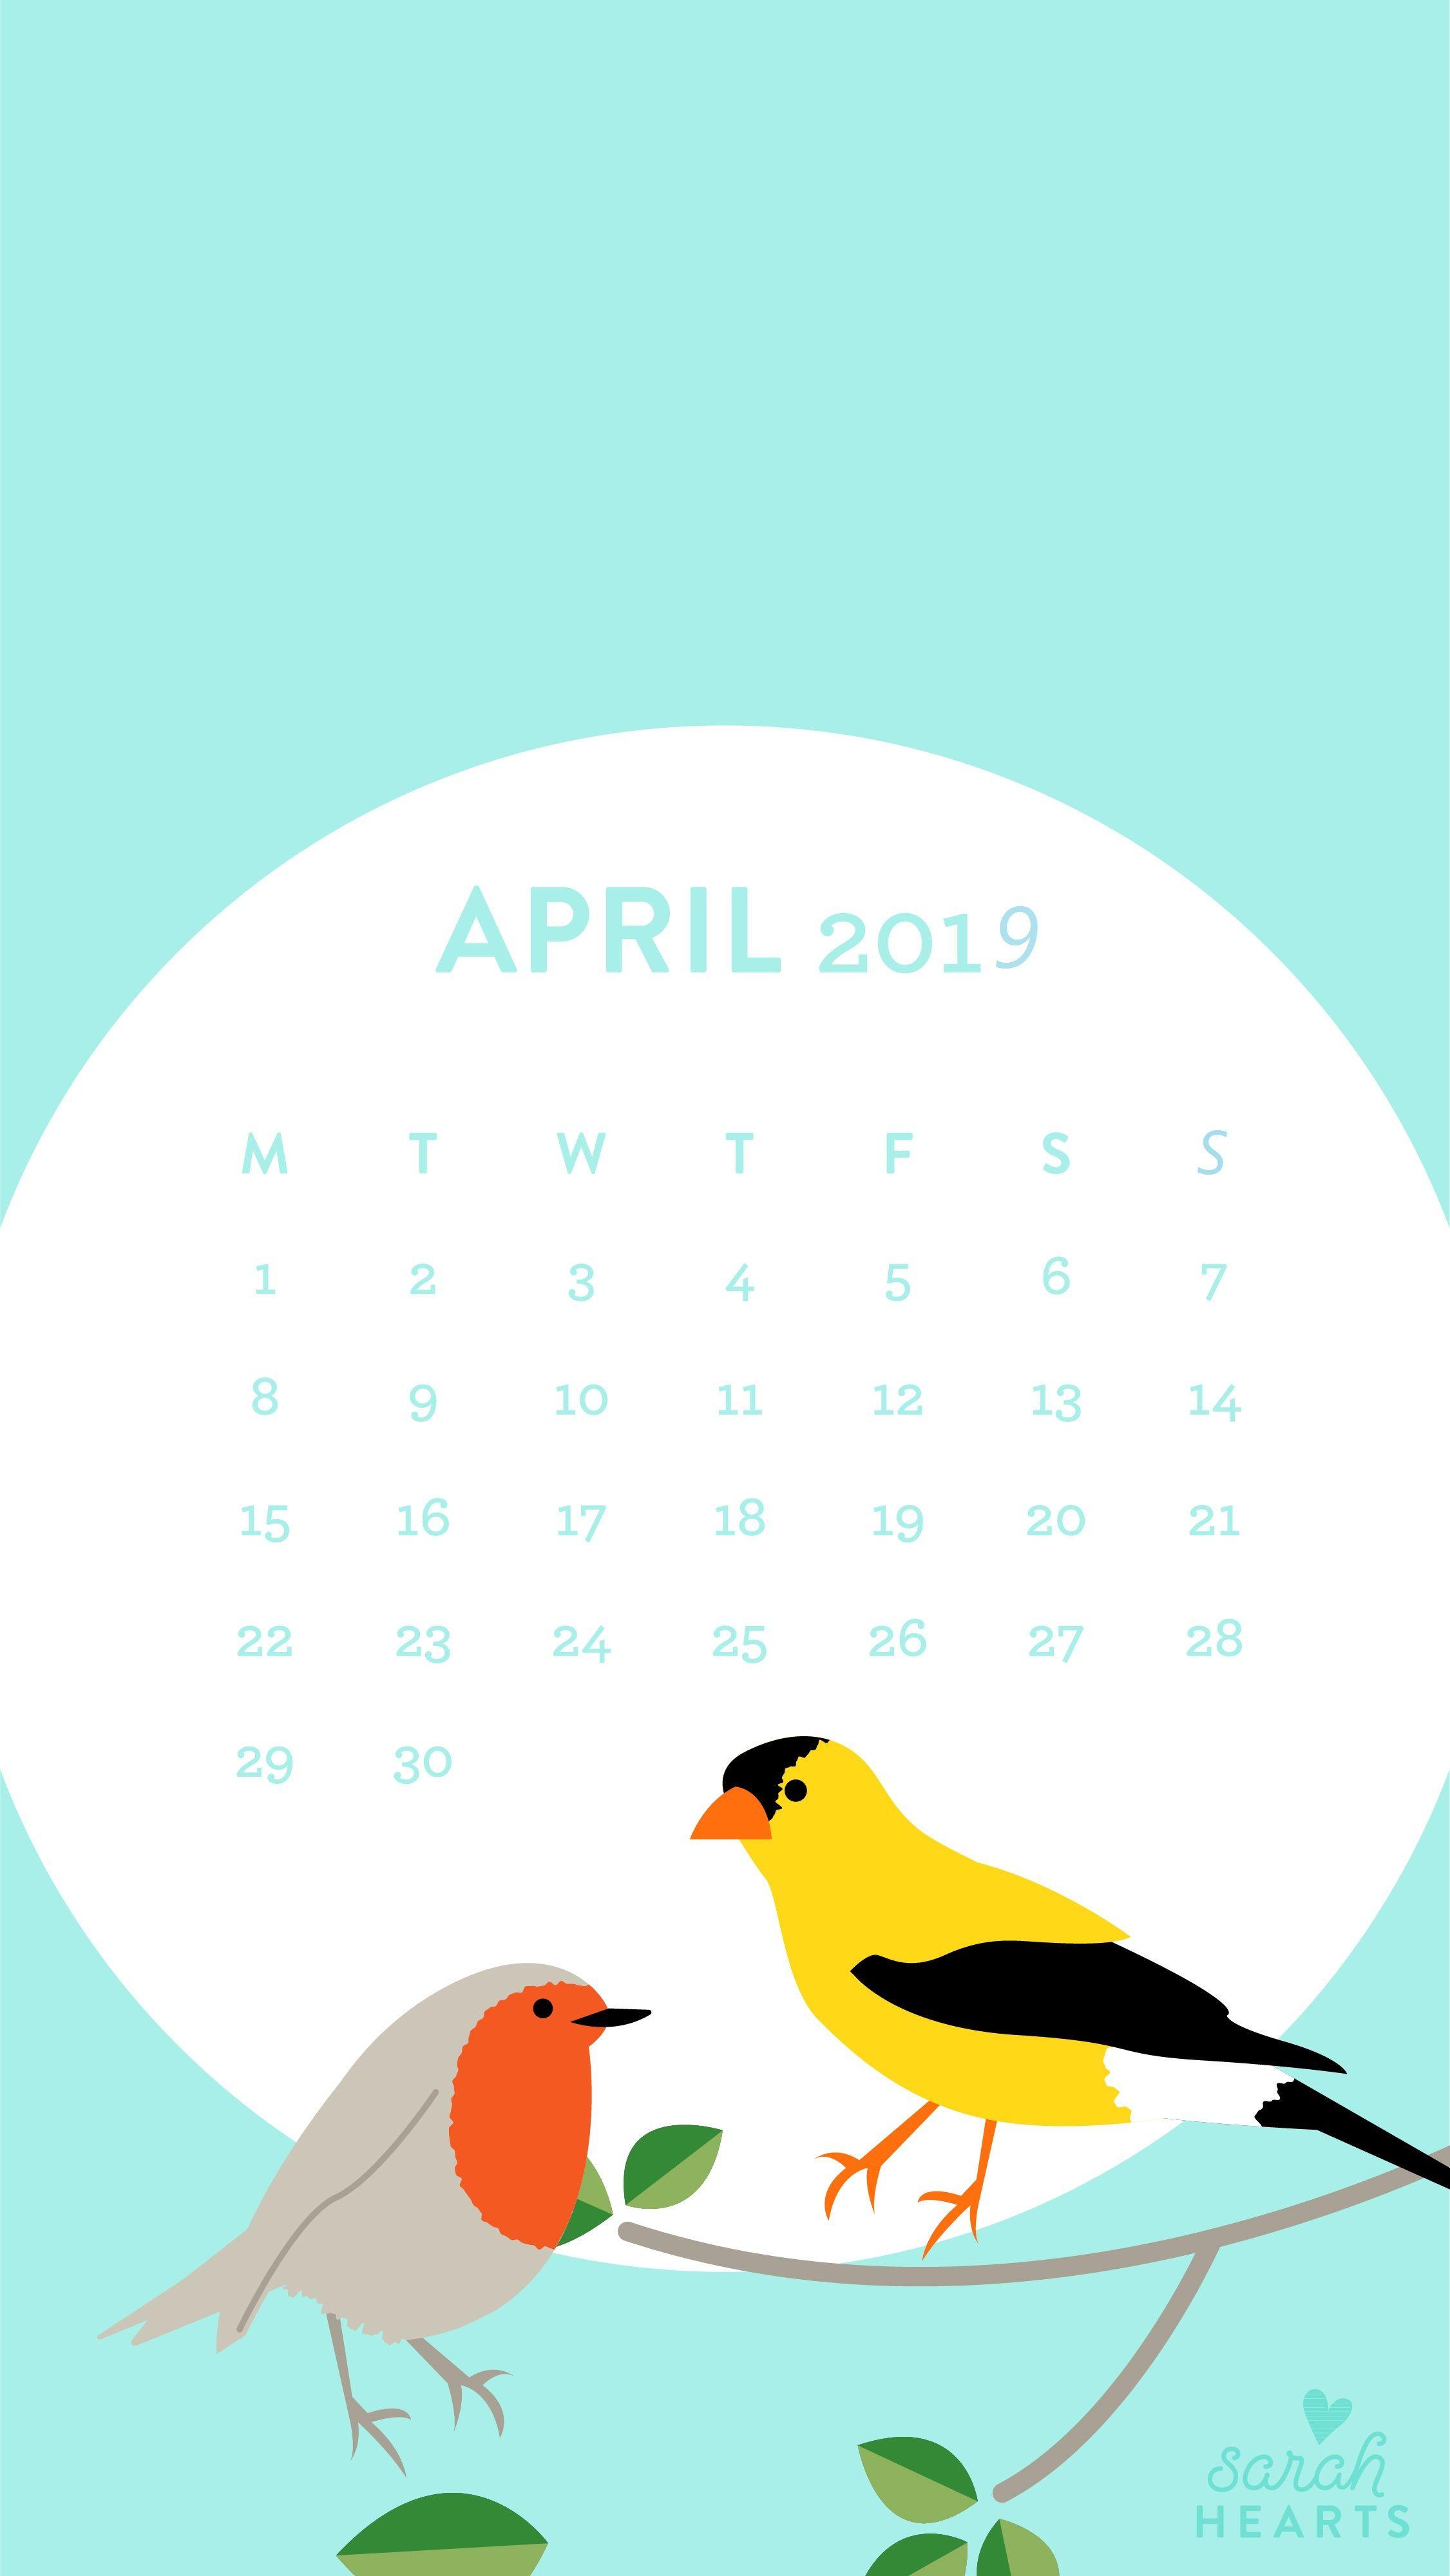 April 2019 Blue Moon Calendar Wallpaper Iphone wallpaper in 2019 2251x4000